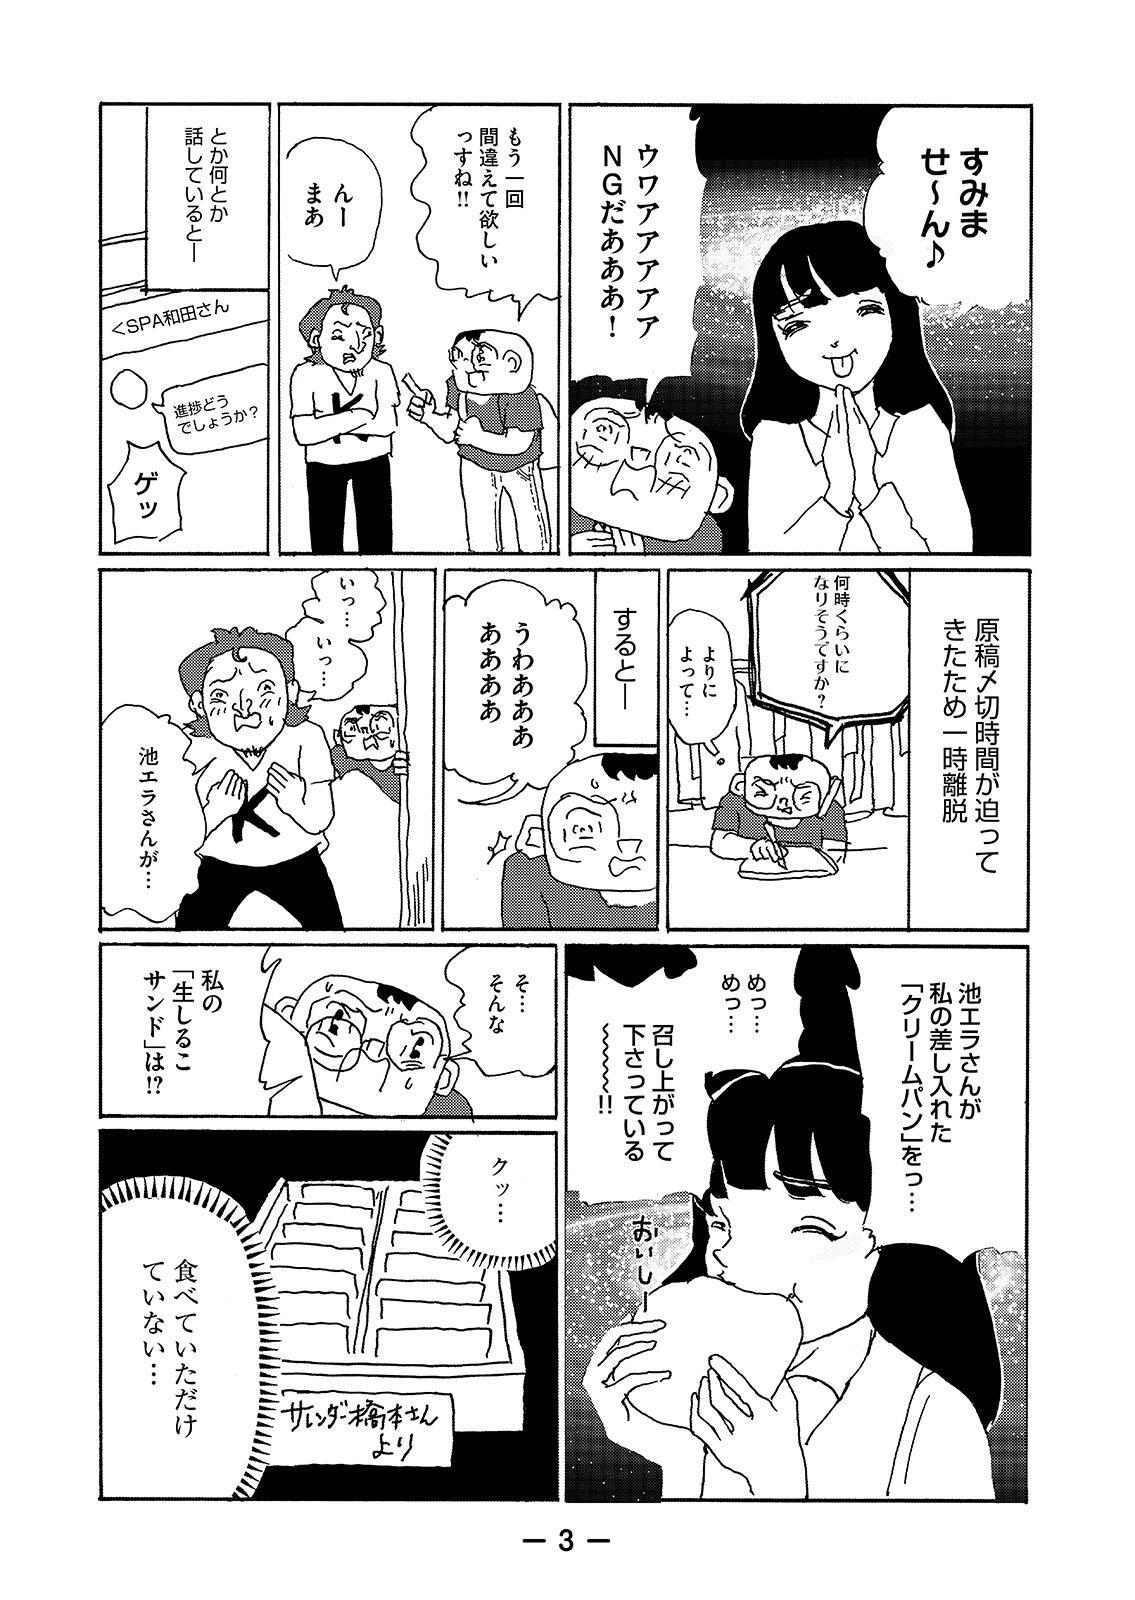 20200821_hatarakazaru_04.jpg